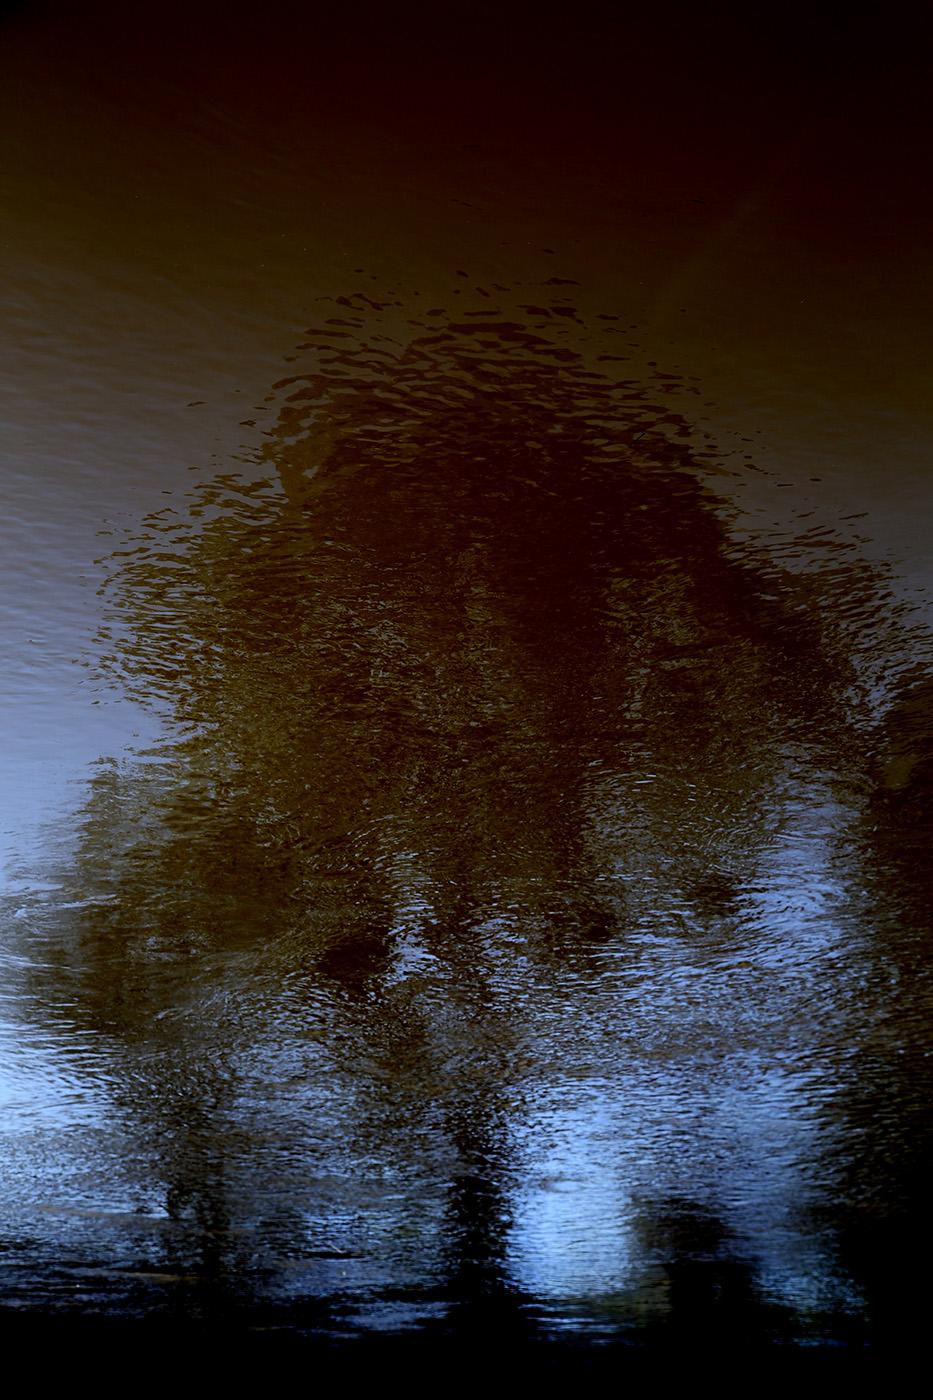 reflectedTree0720.jpg